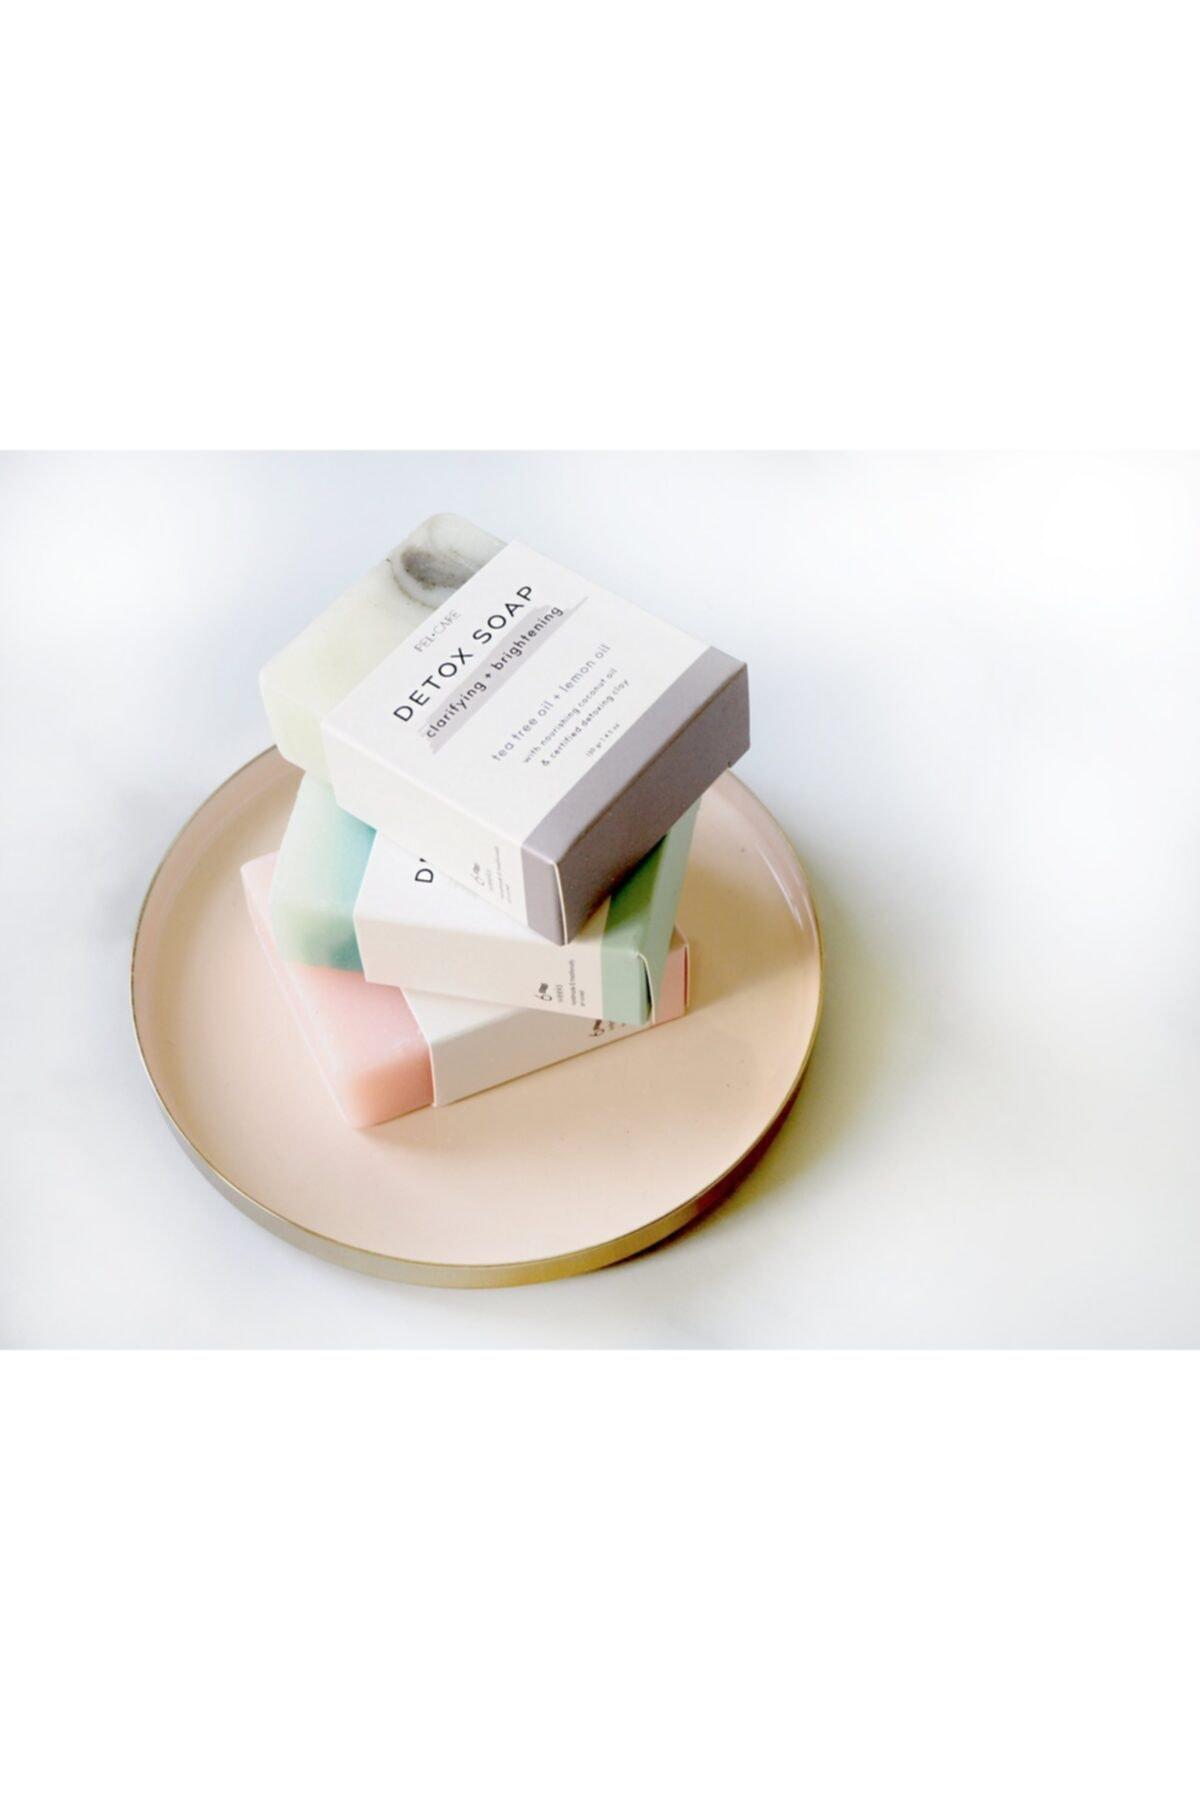 Pelcare MARBLE Brightening Soap Bar 2